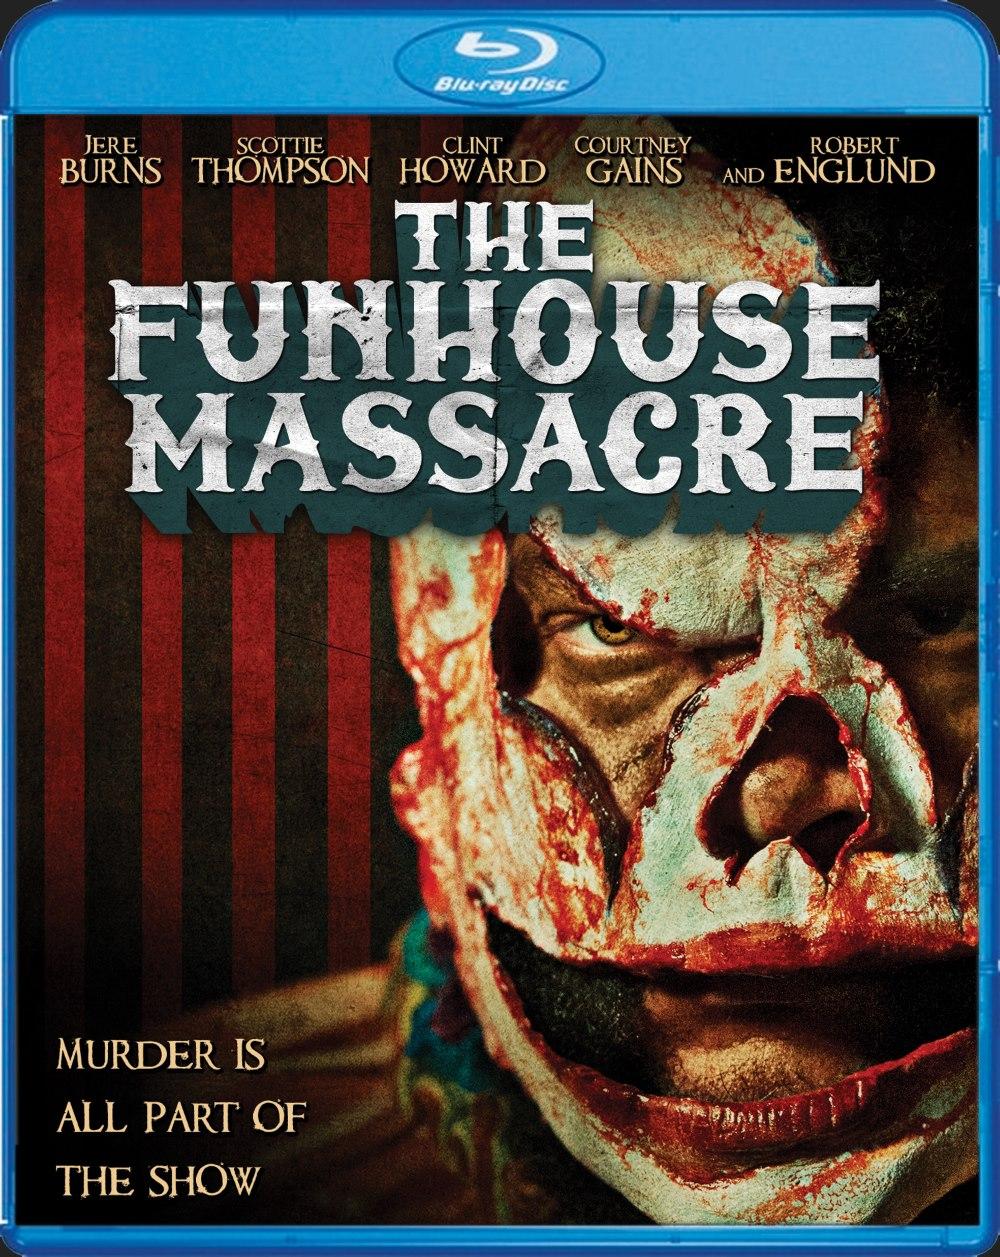 The_Funhouse_Massacre_Blu-ray_Cover_Art